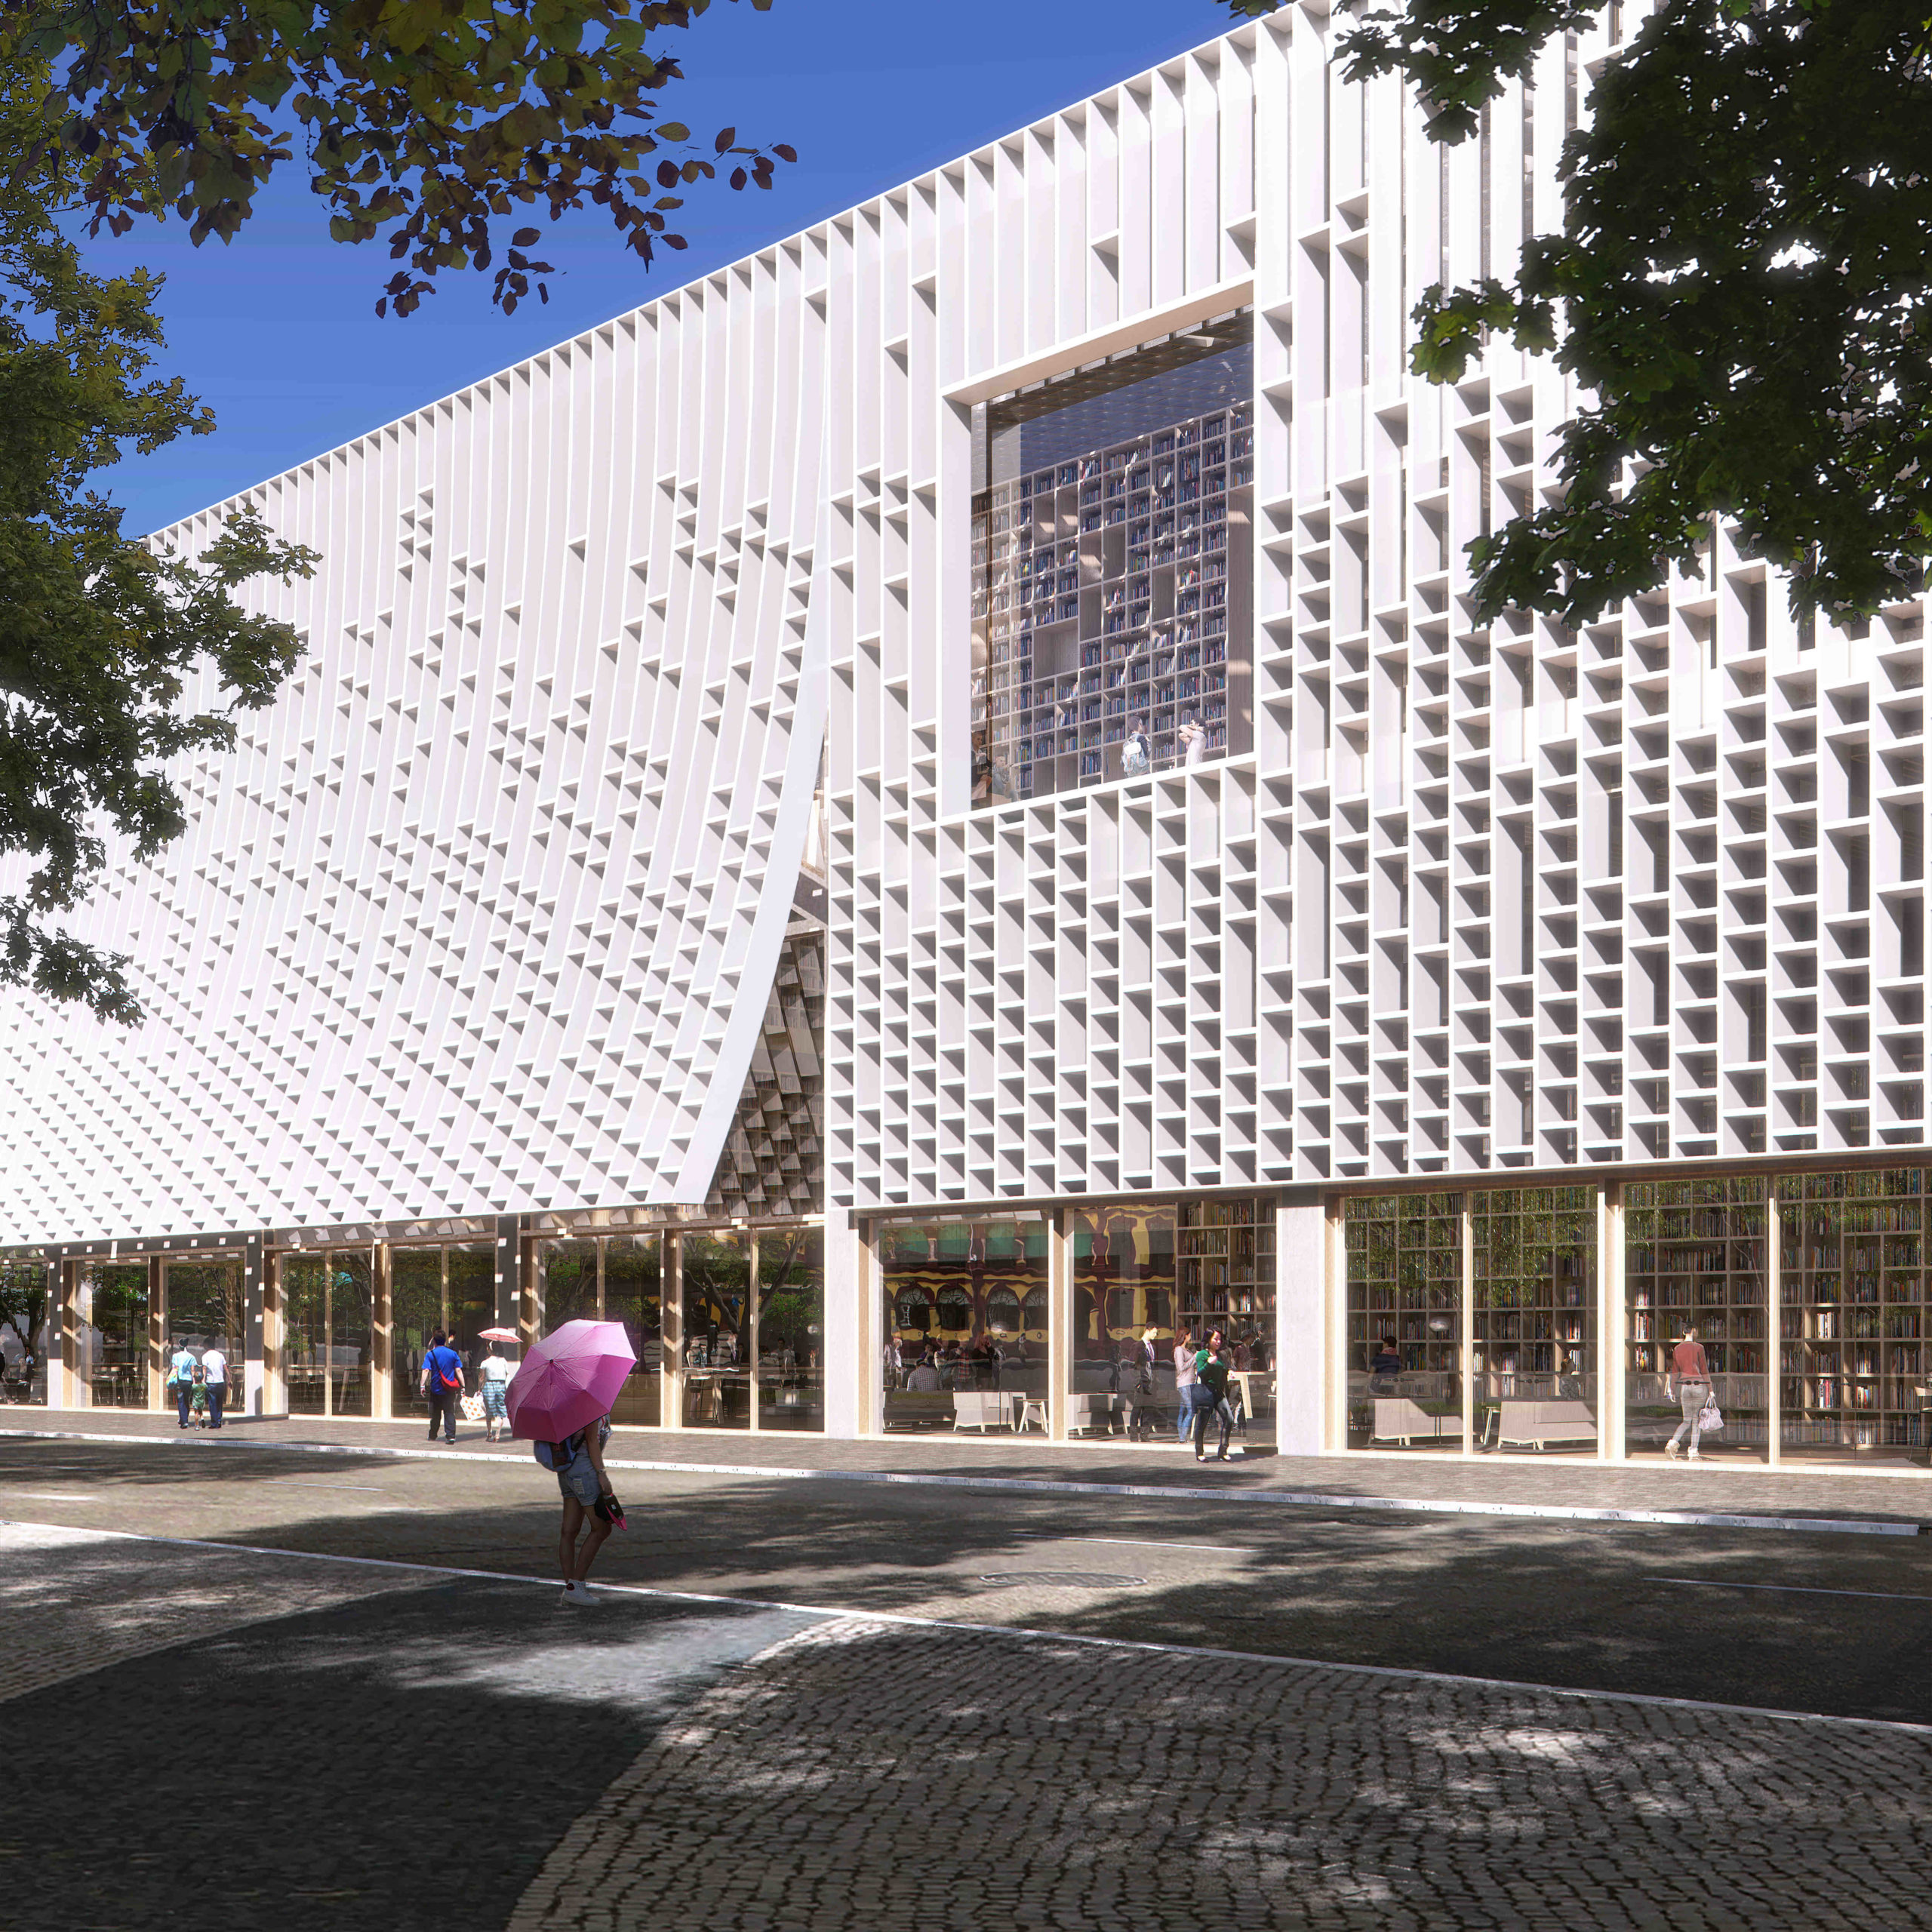 Projecto de atelier holandês escolhido para a Biblioteca Central